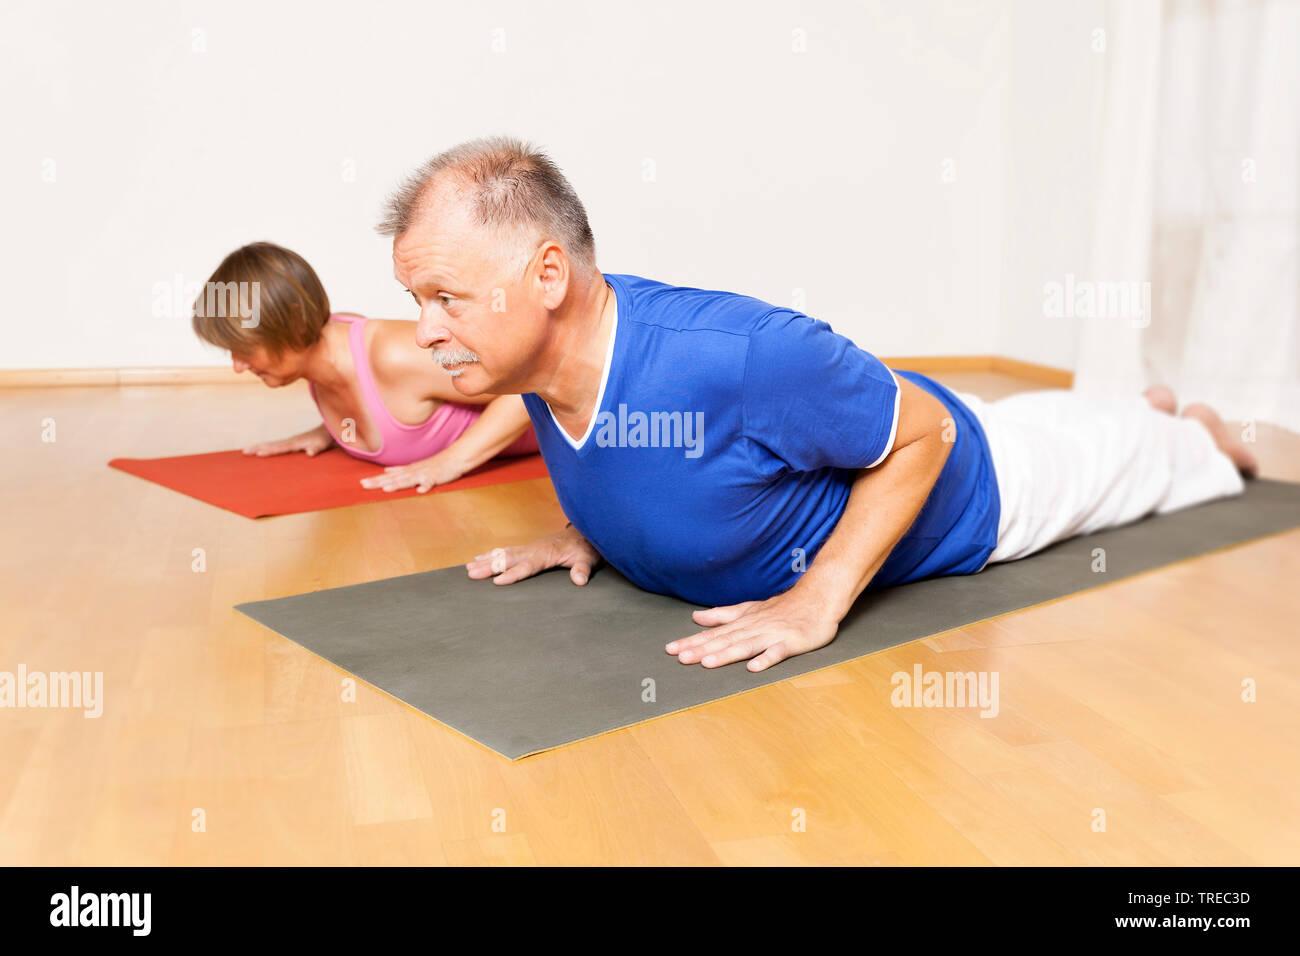 Frau und Mann machen Yoga-Uebungen, Europa | woman and man doing yoga, Europe | BLWS522594.jpg [ (c) blickwinkel/McPHOTO/M. Gann Tel. +49 (0)2302-2793 - Stock Image